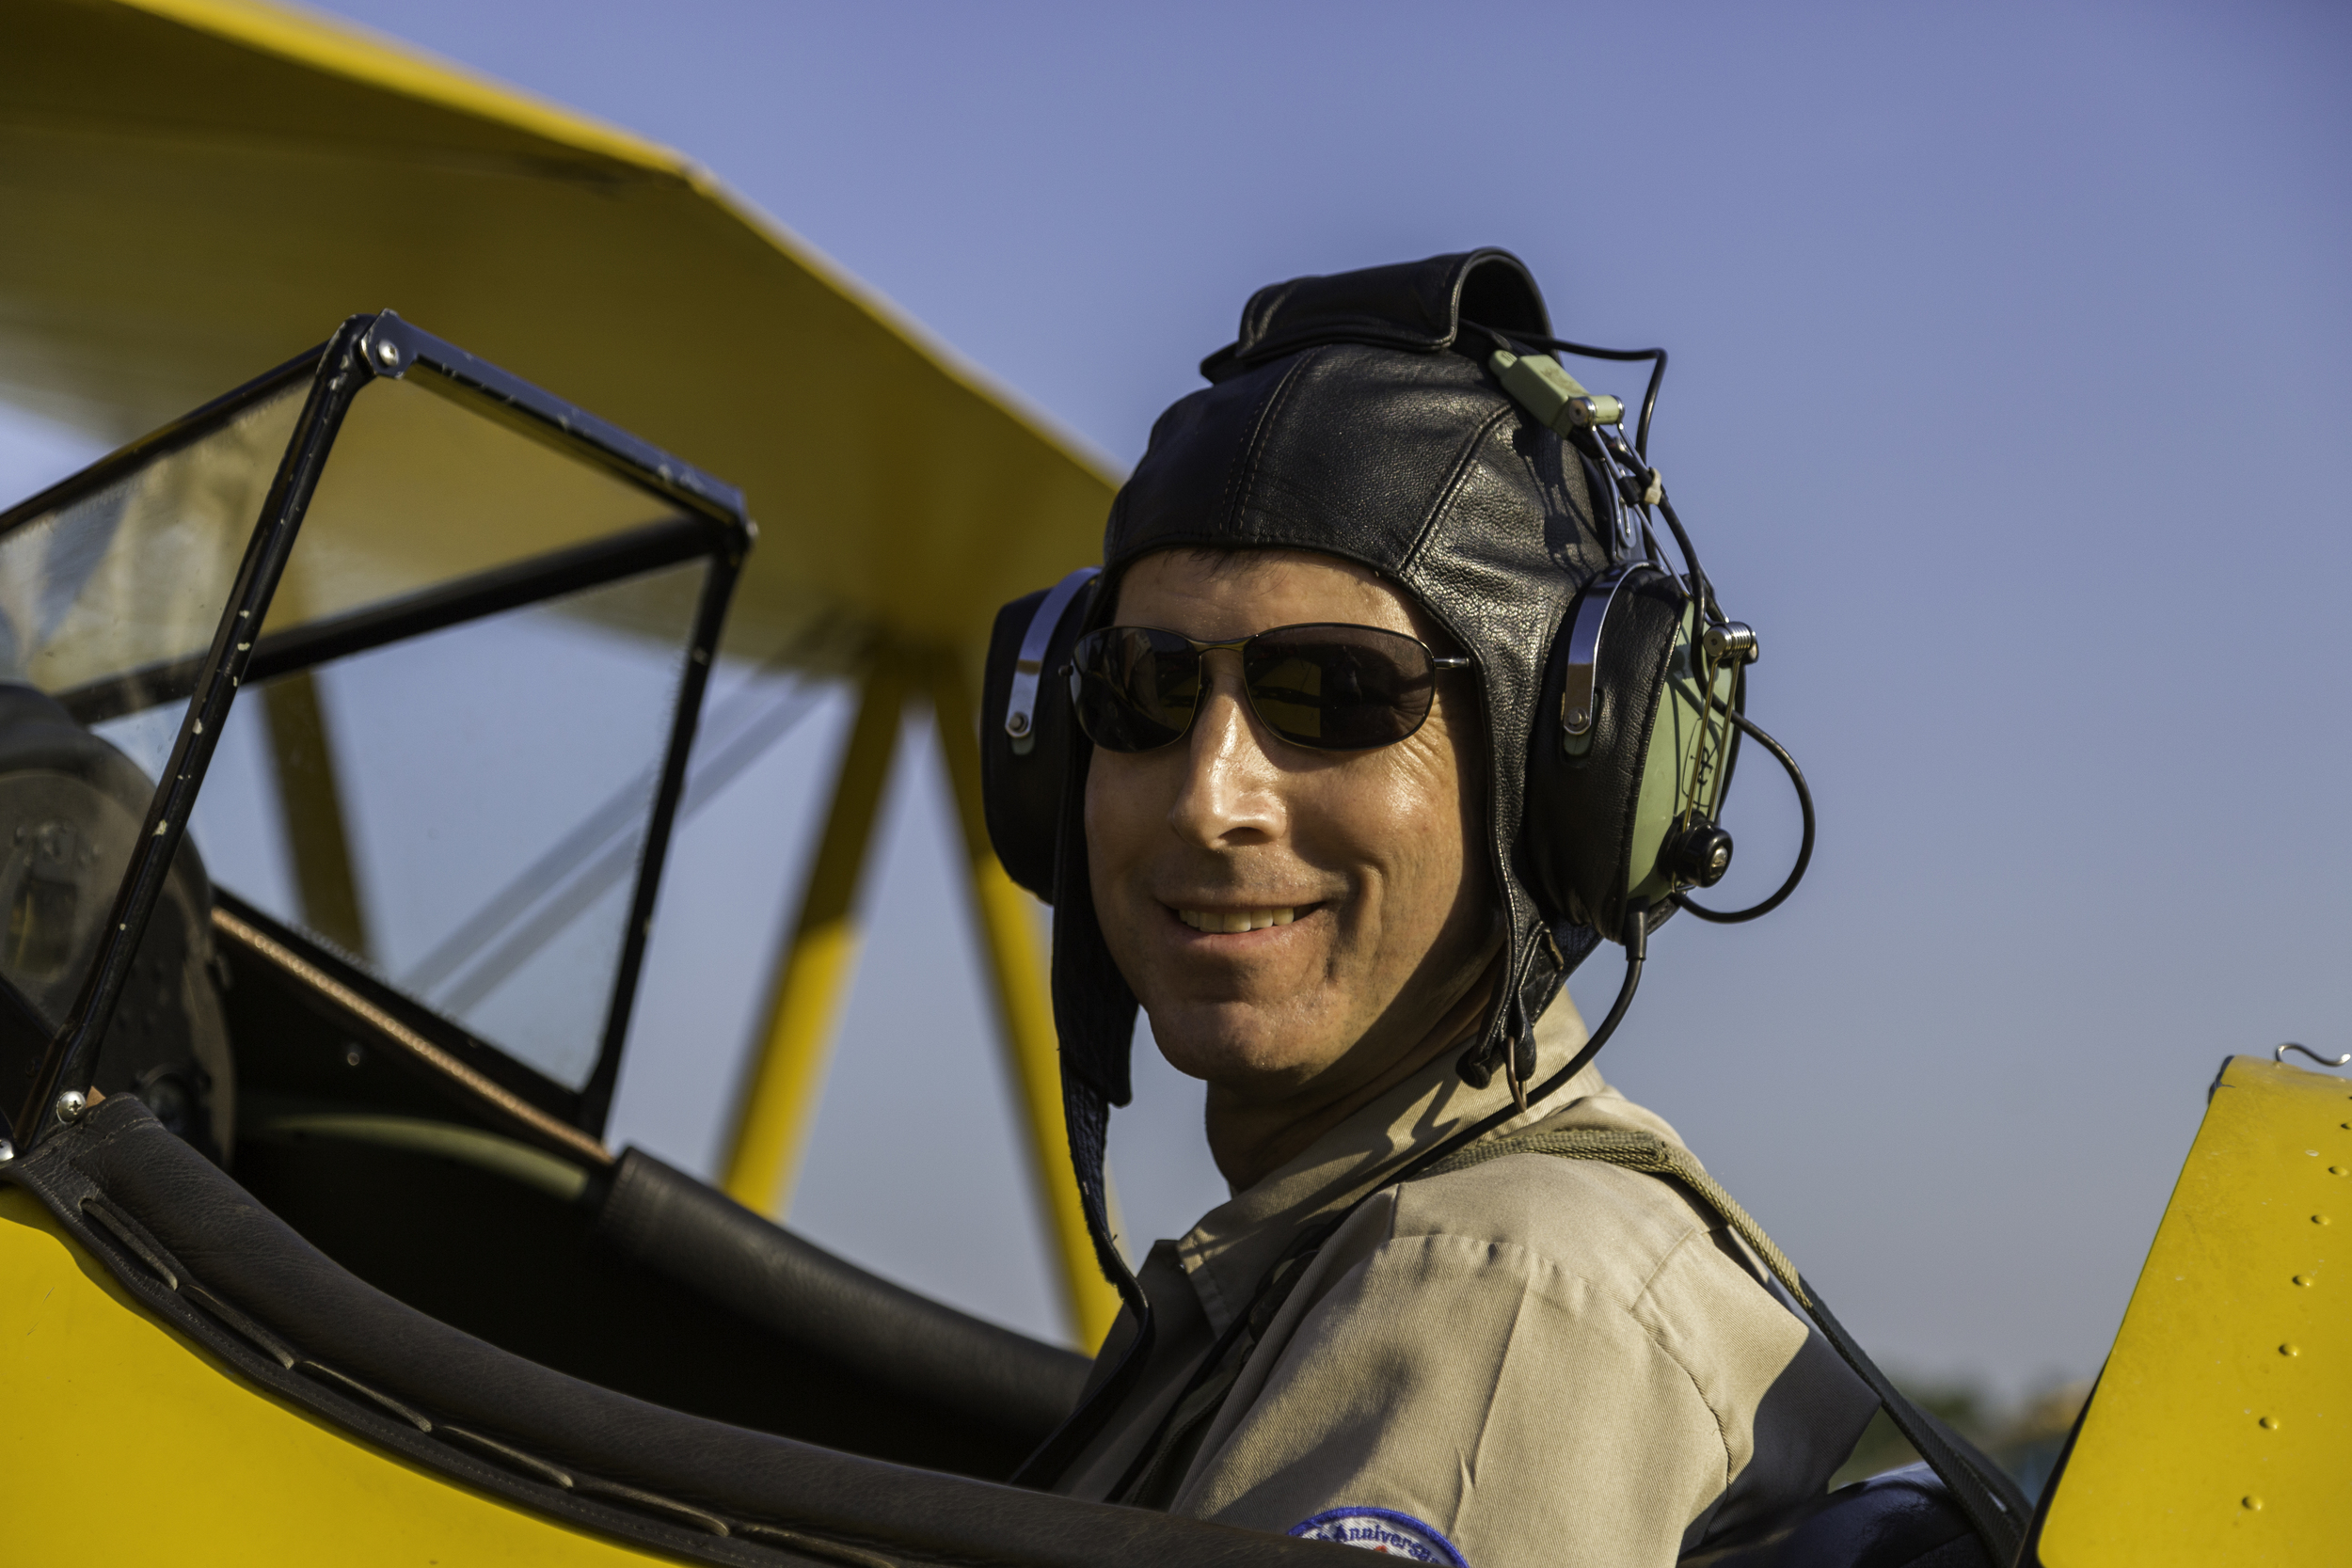 John, the pilot of #747 after we landed.